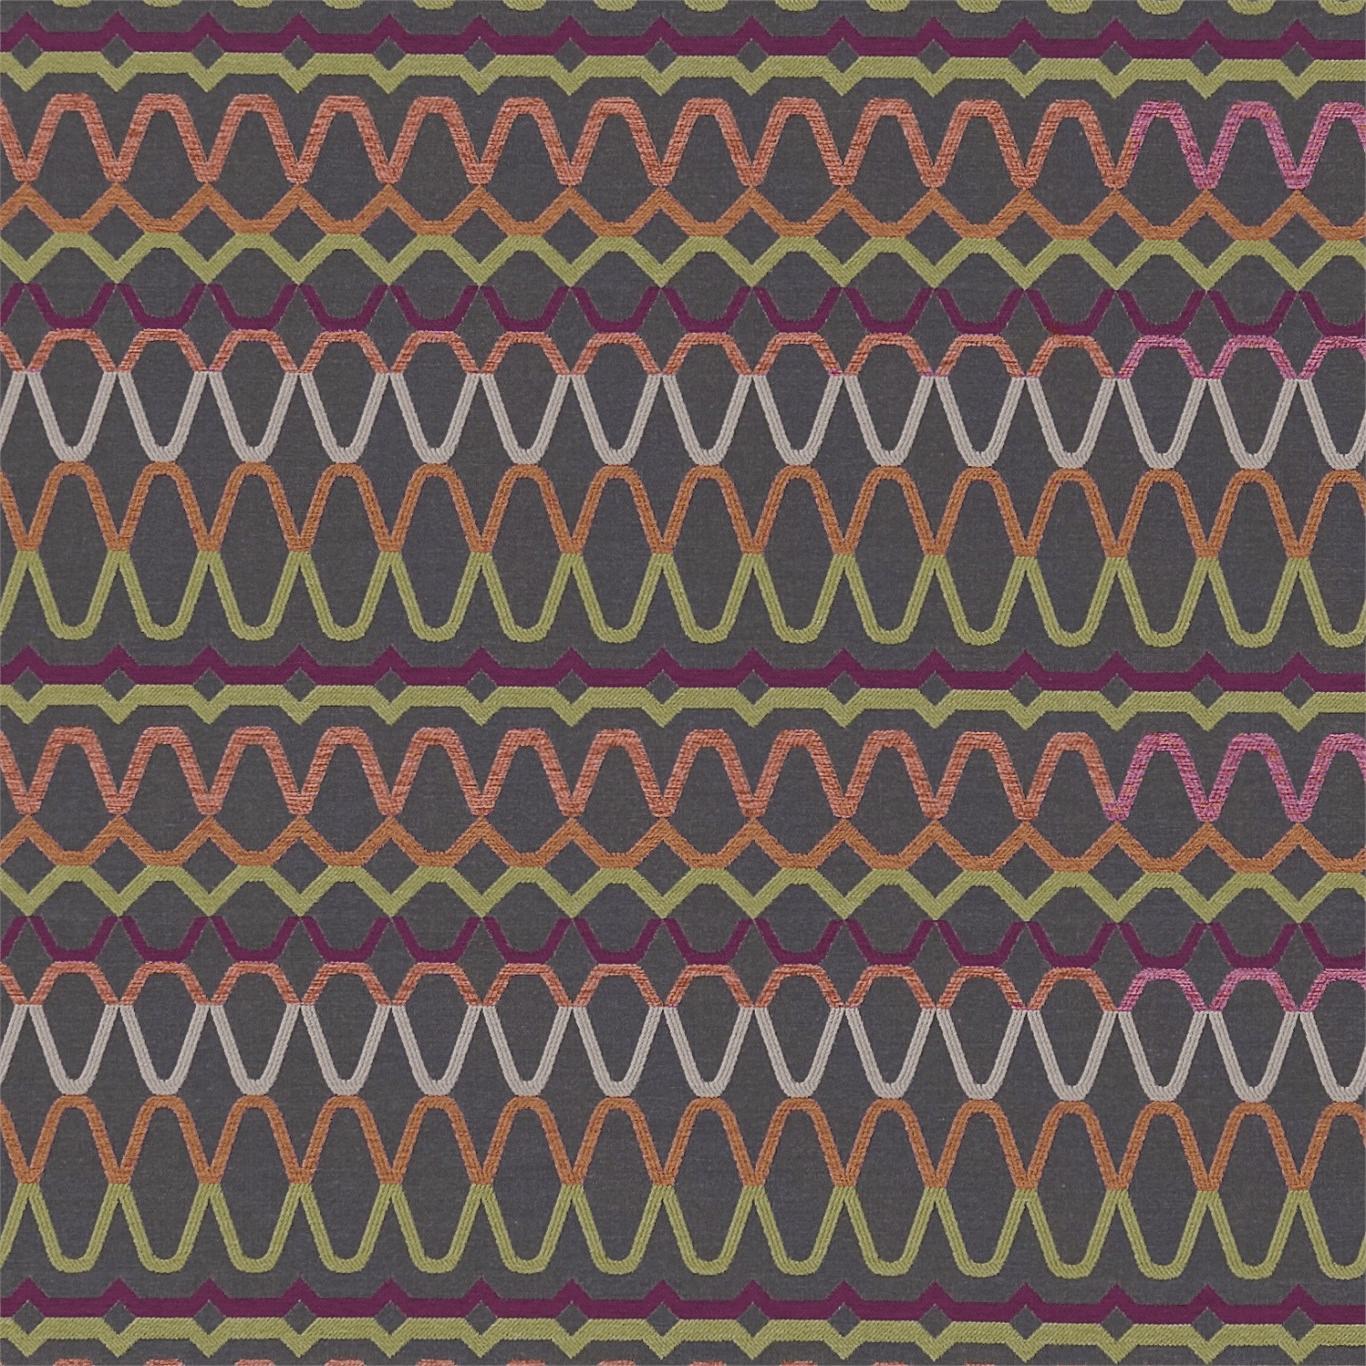 Ada Fabric Slate Spice Pear By Scion 131197